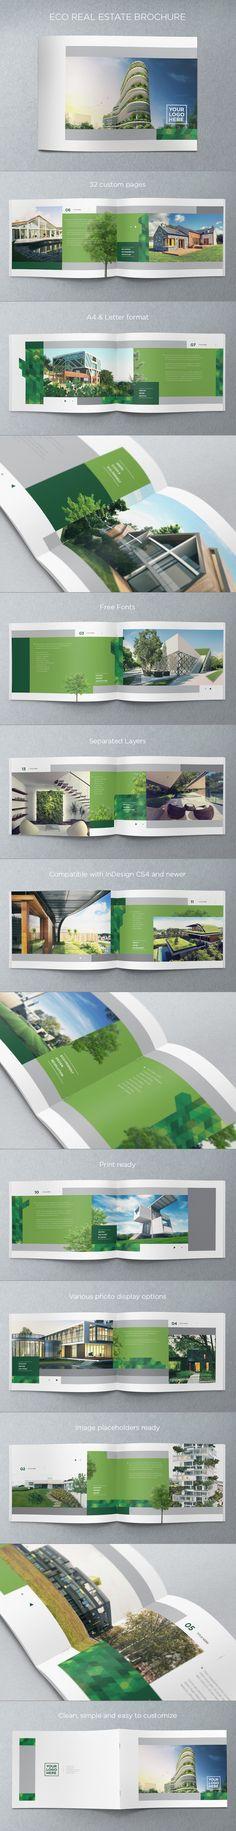 Eco Real Estate Brochure. Download here: http://graphicriver.net/item/eco-real-estate-brochure/4718641?ref=abradesign #design #brochure